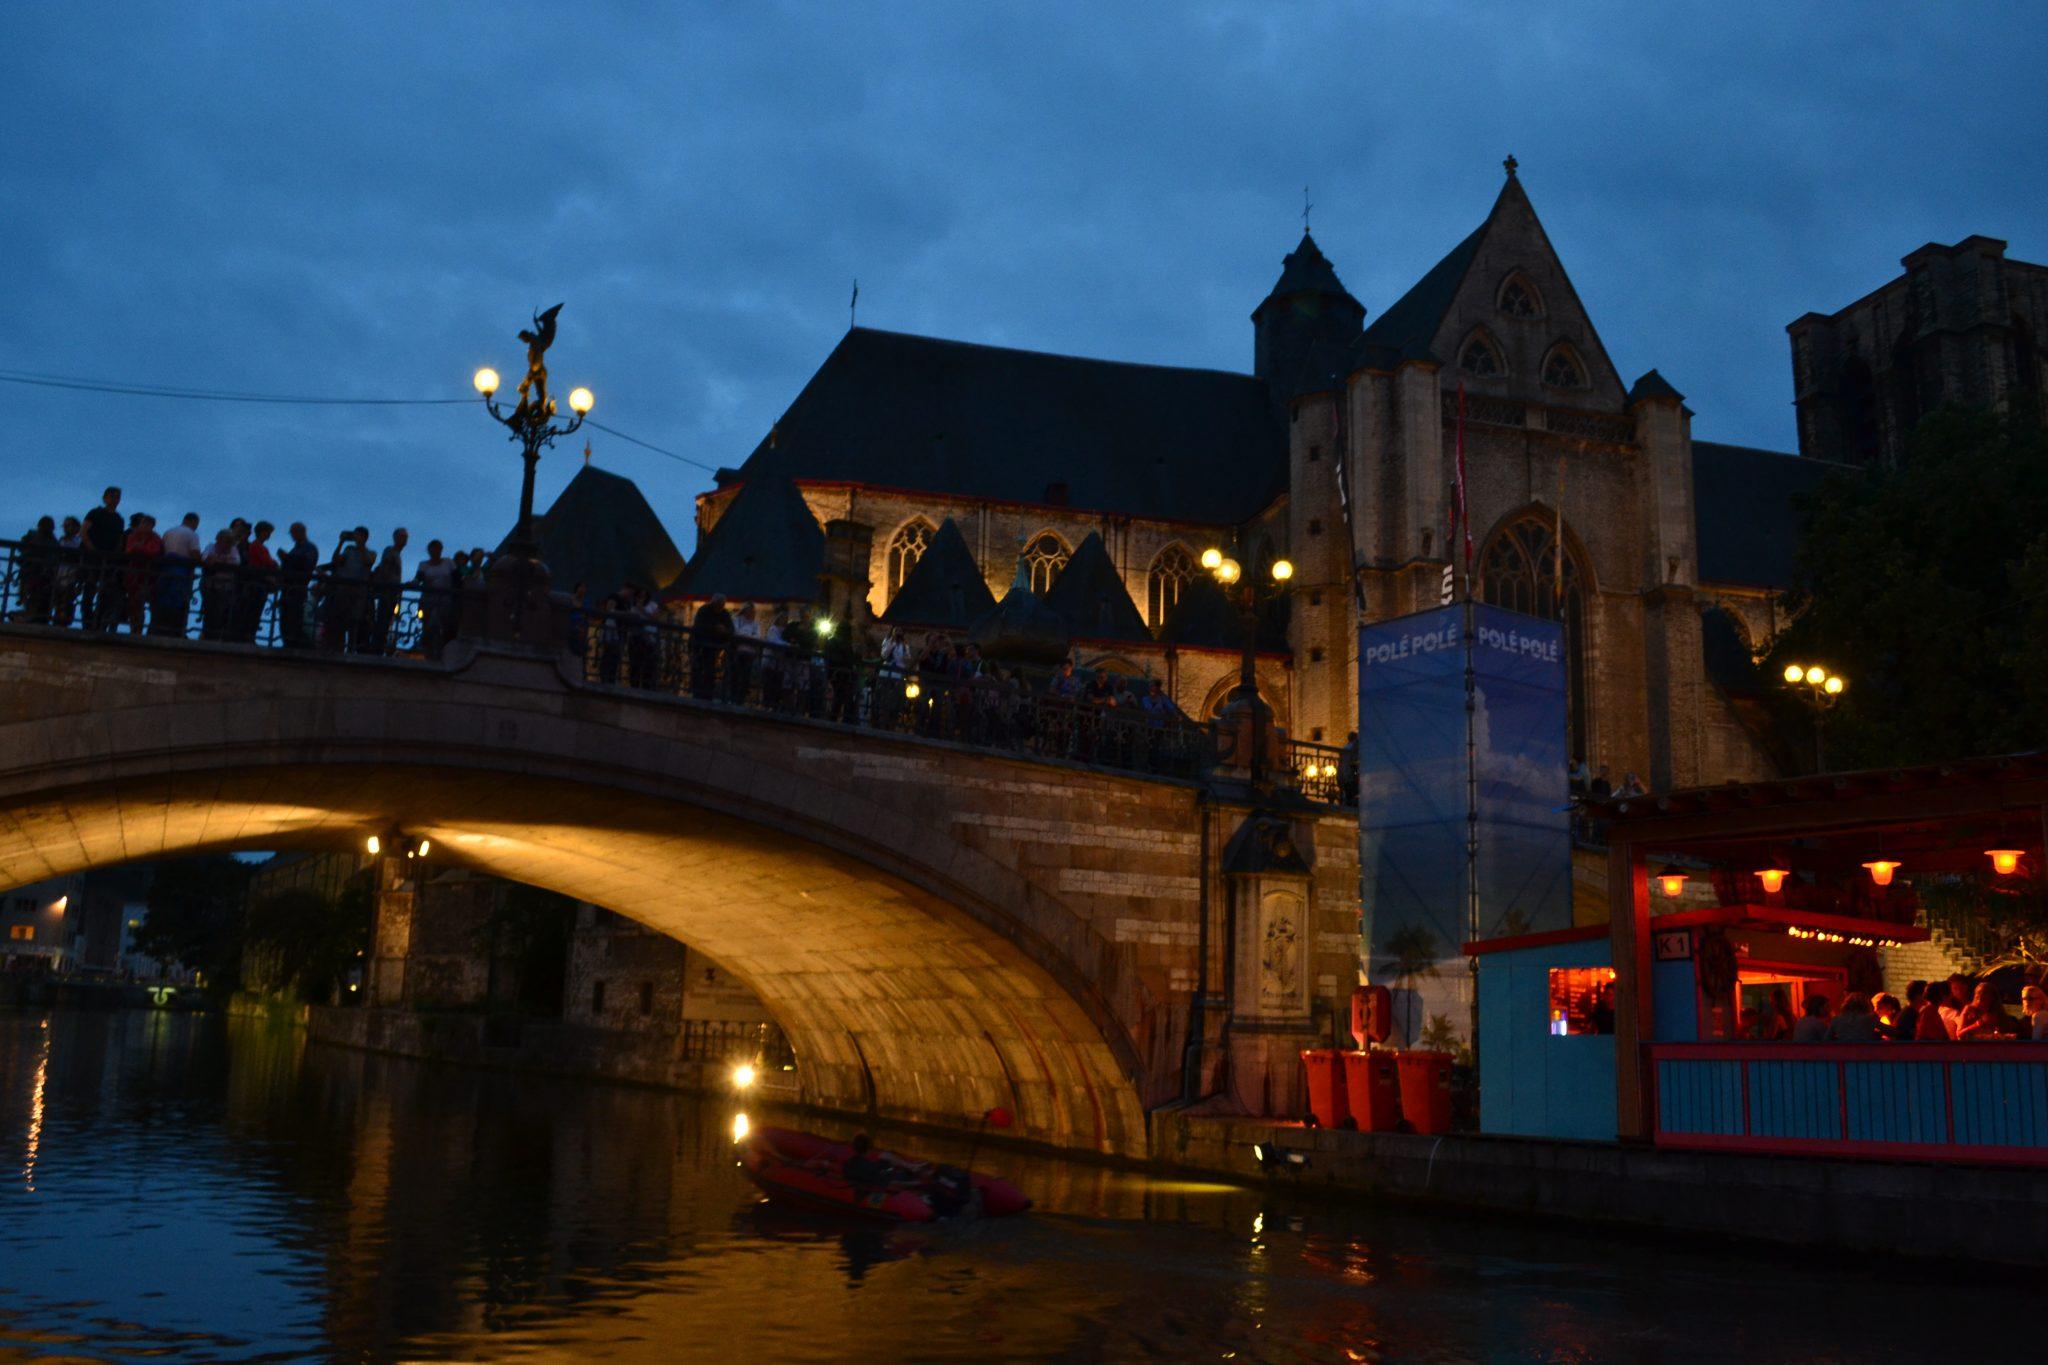 Musikfestival Gent - dsc 0140